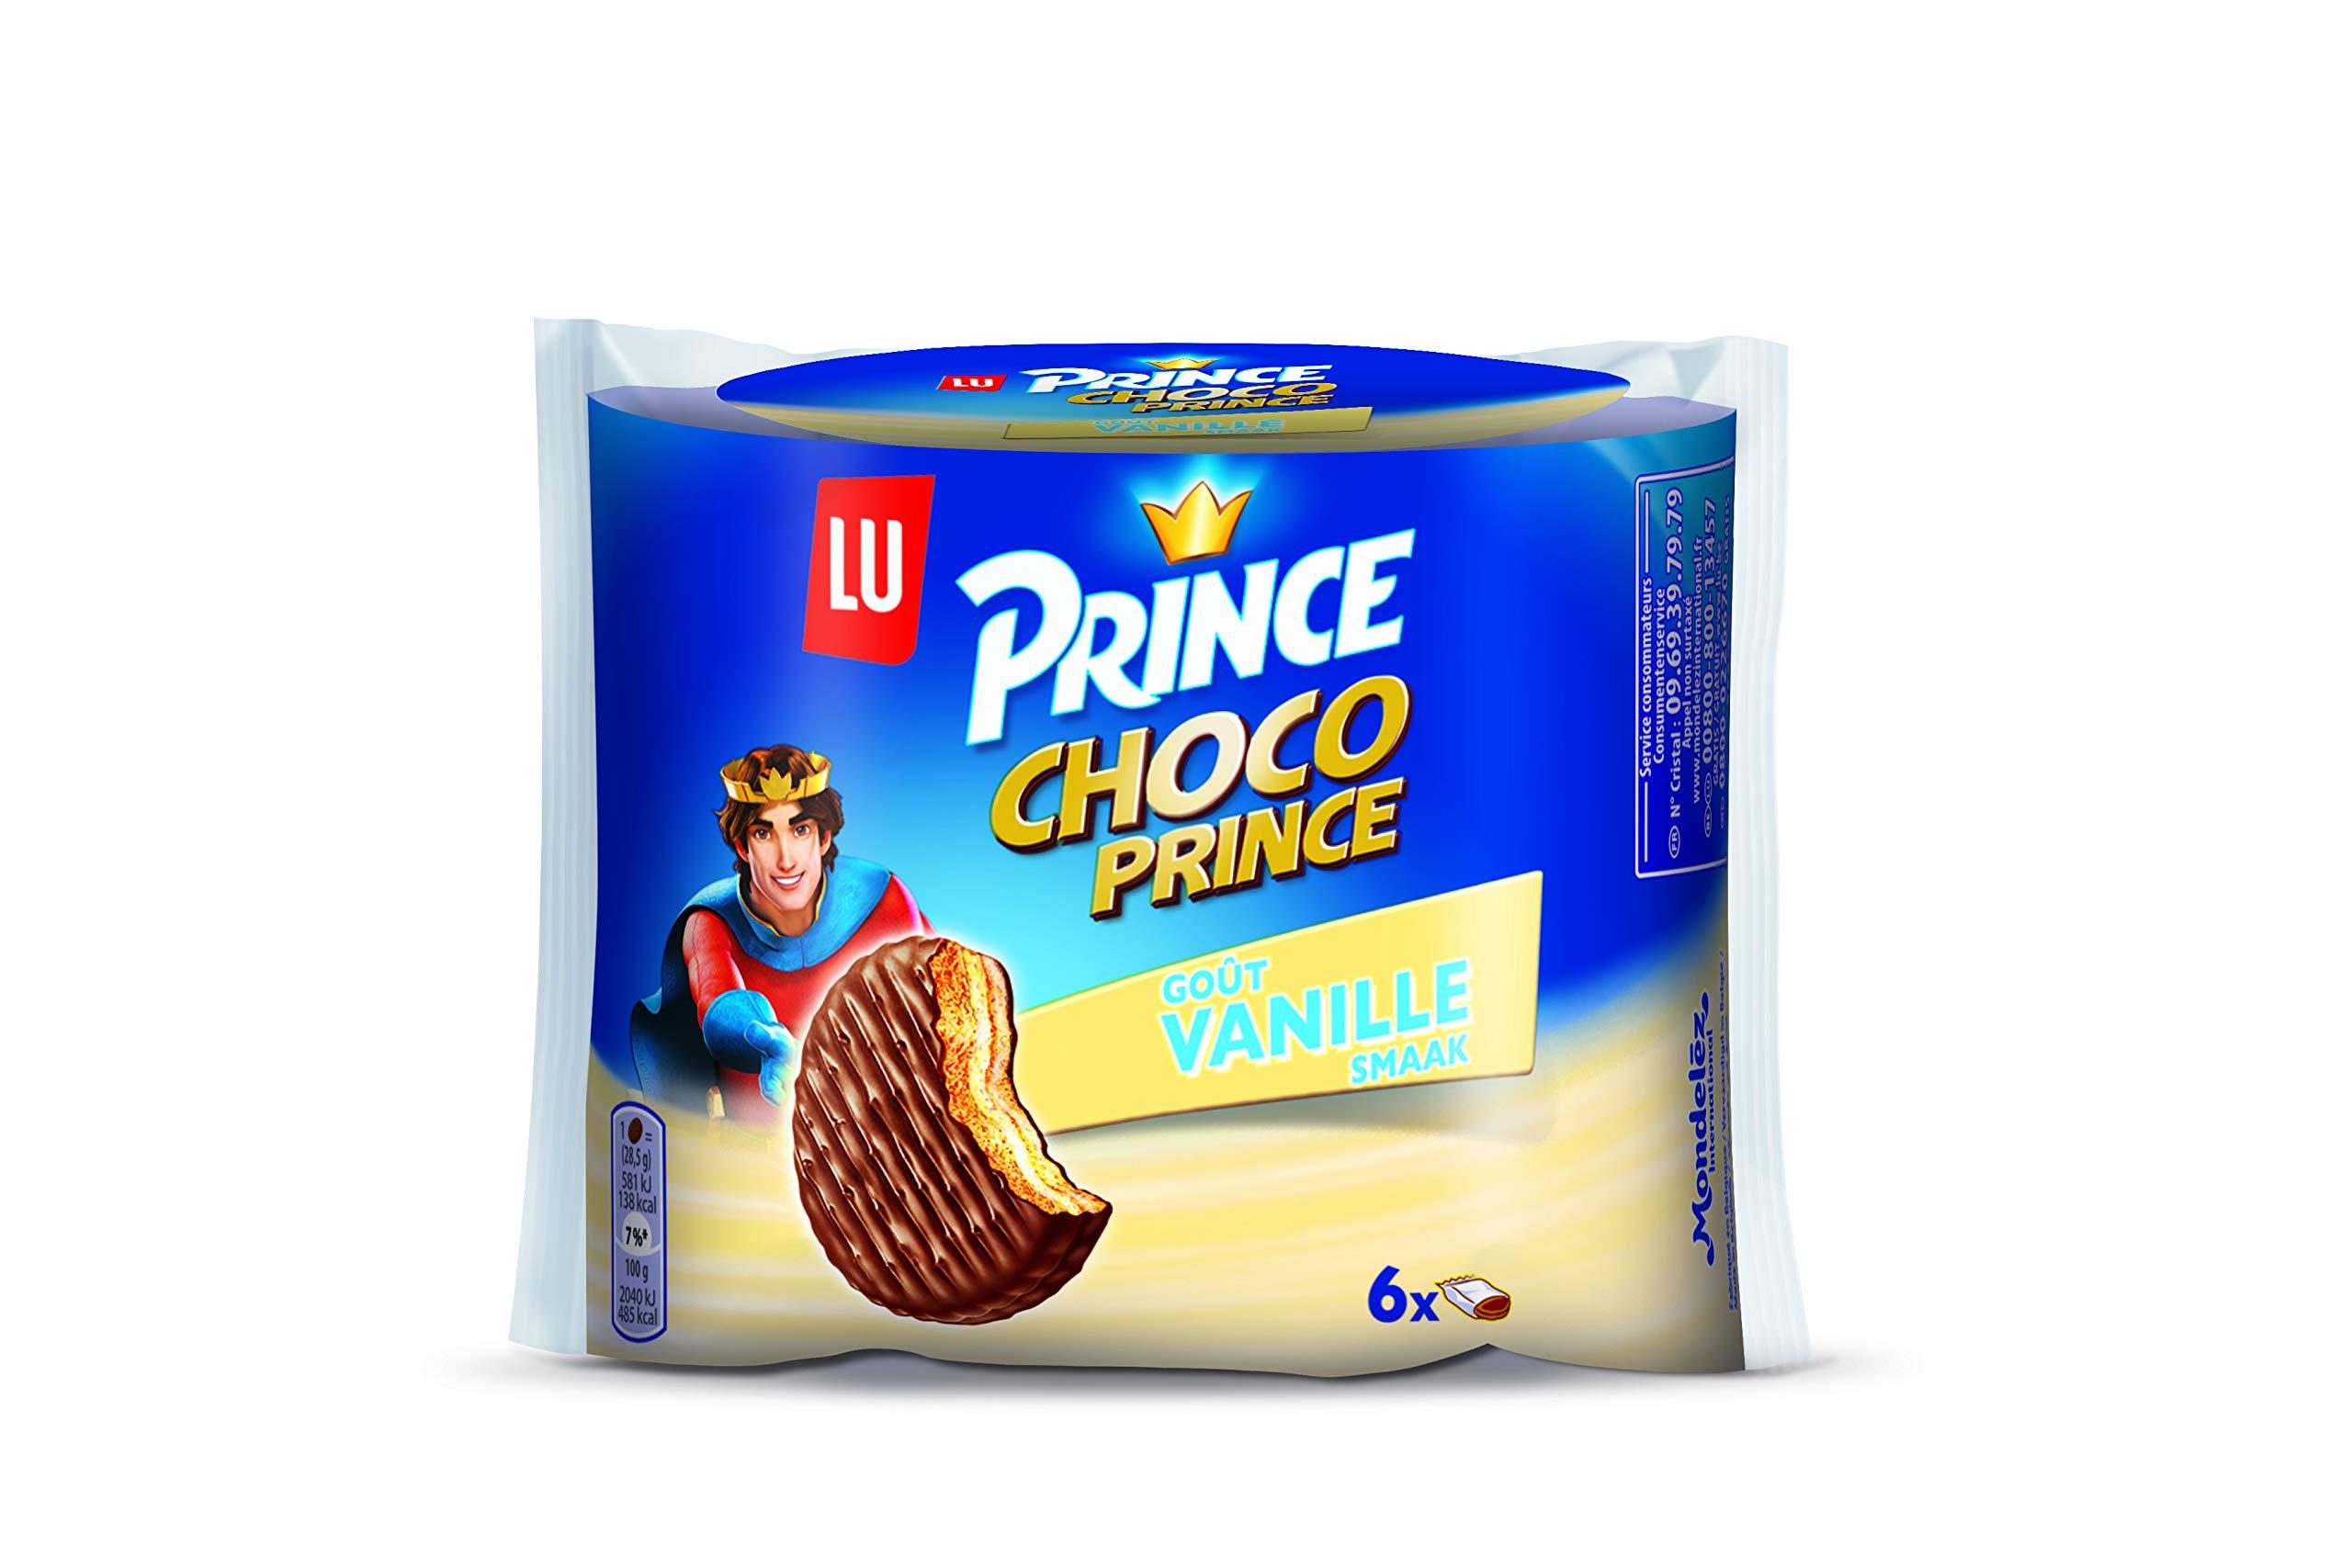 Chocolate Biscuits   Lu   Prince Biscuit Choco Vanilla 6 Cookies   Total Weight 170 Grams